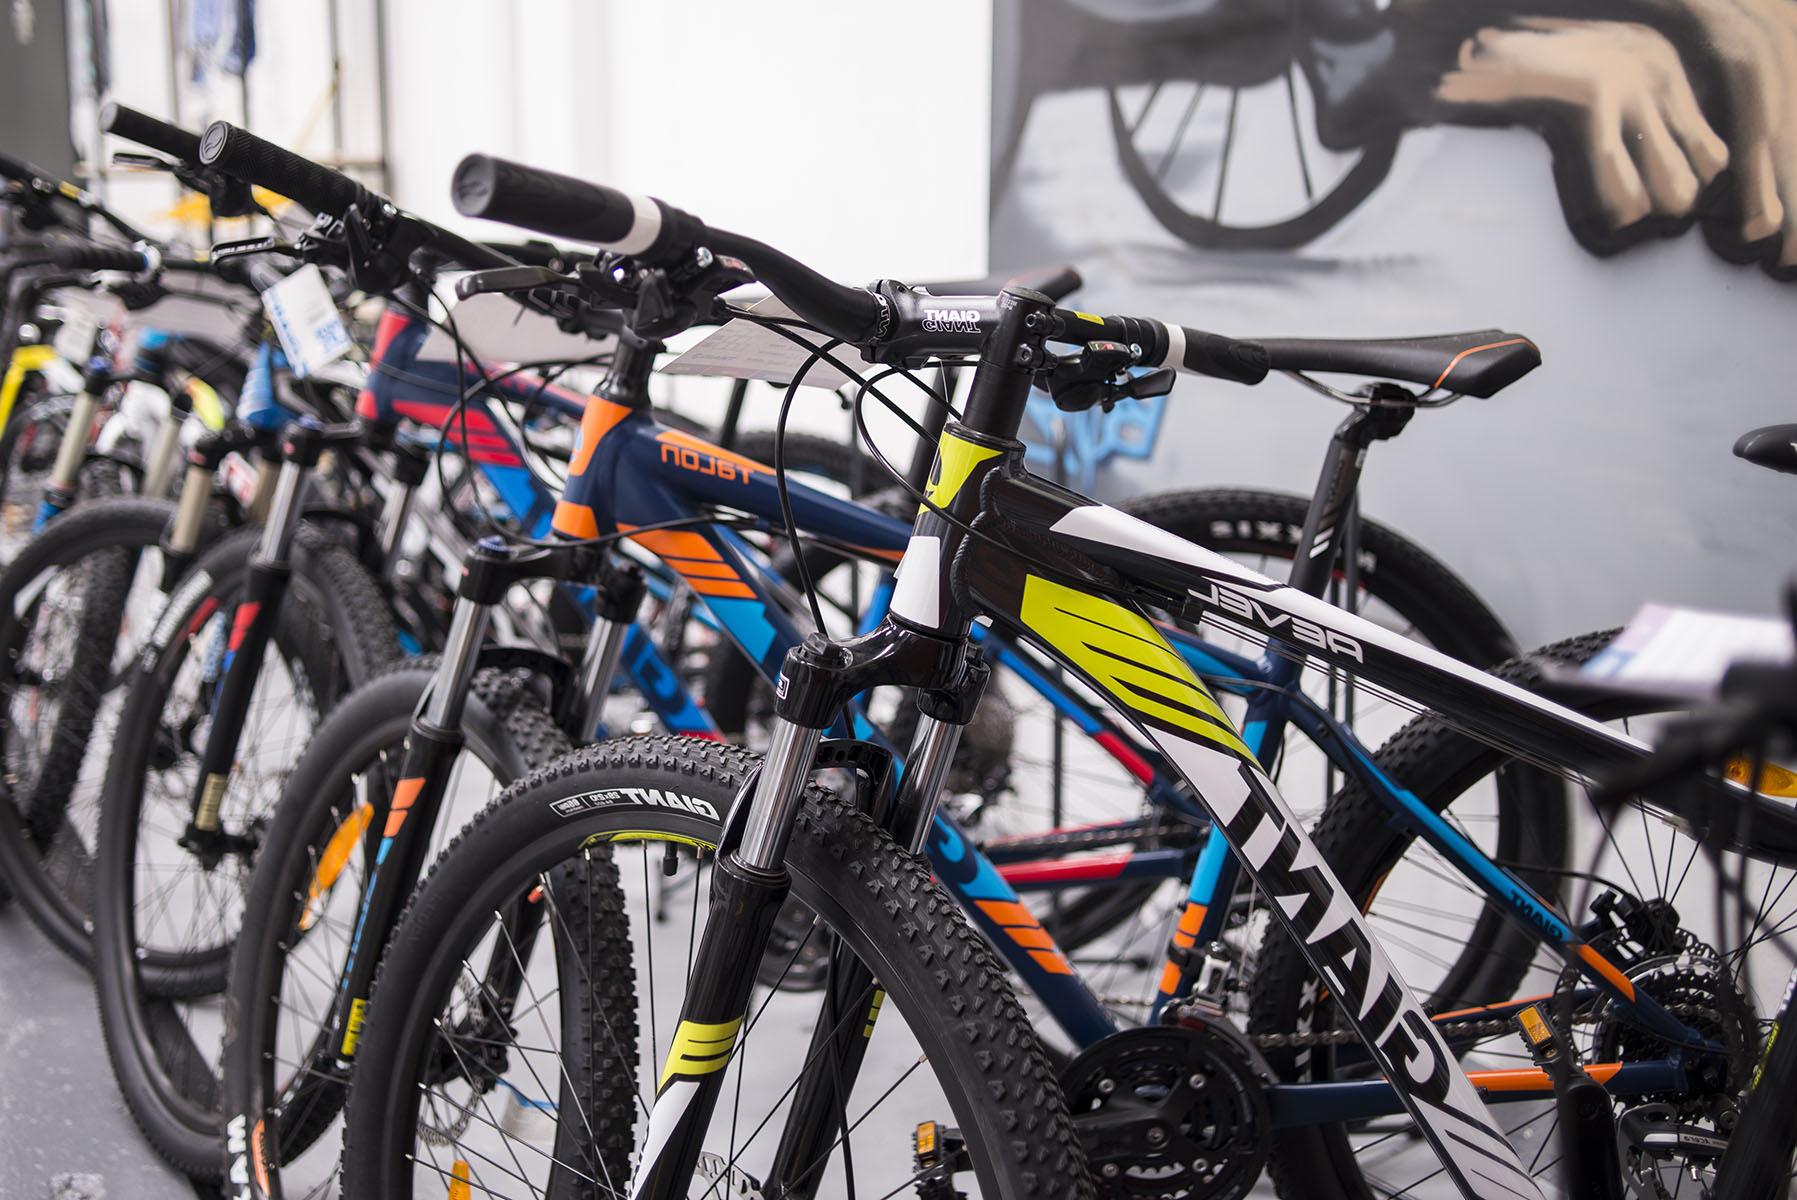 bicicletas giant bikes en perspectiva